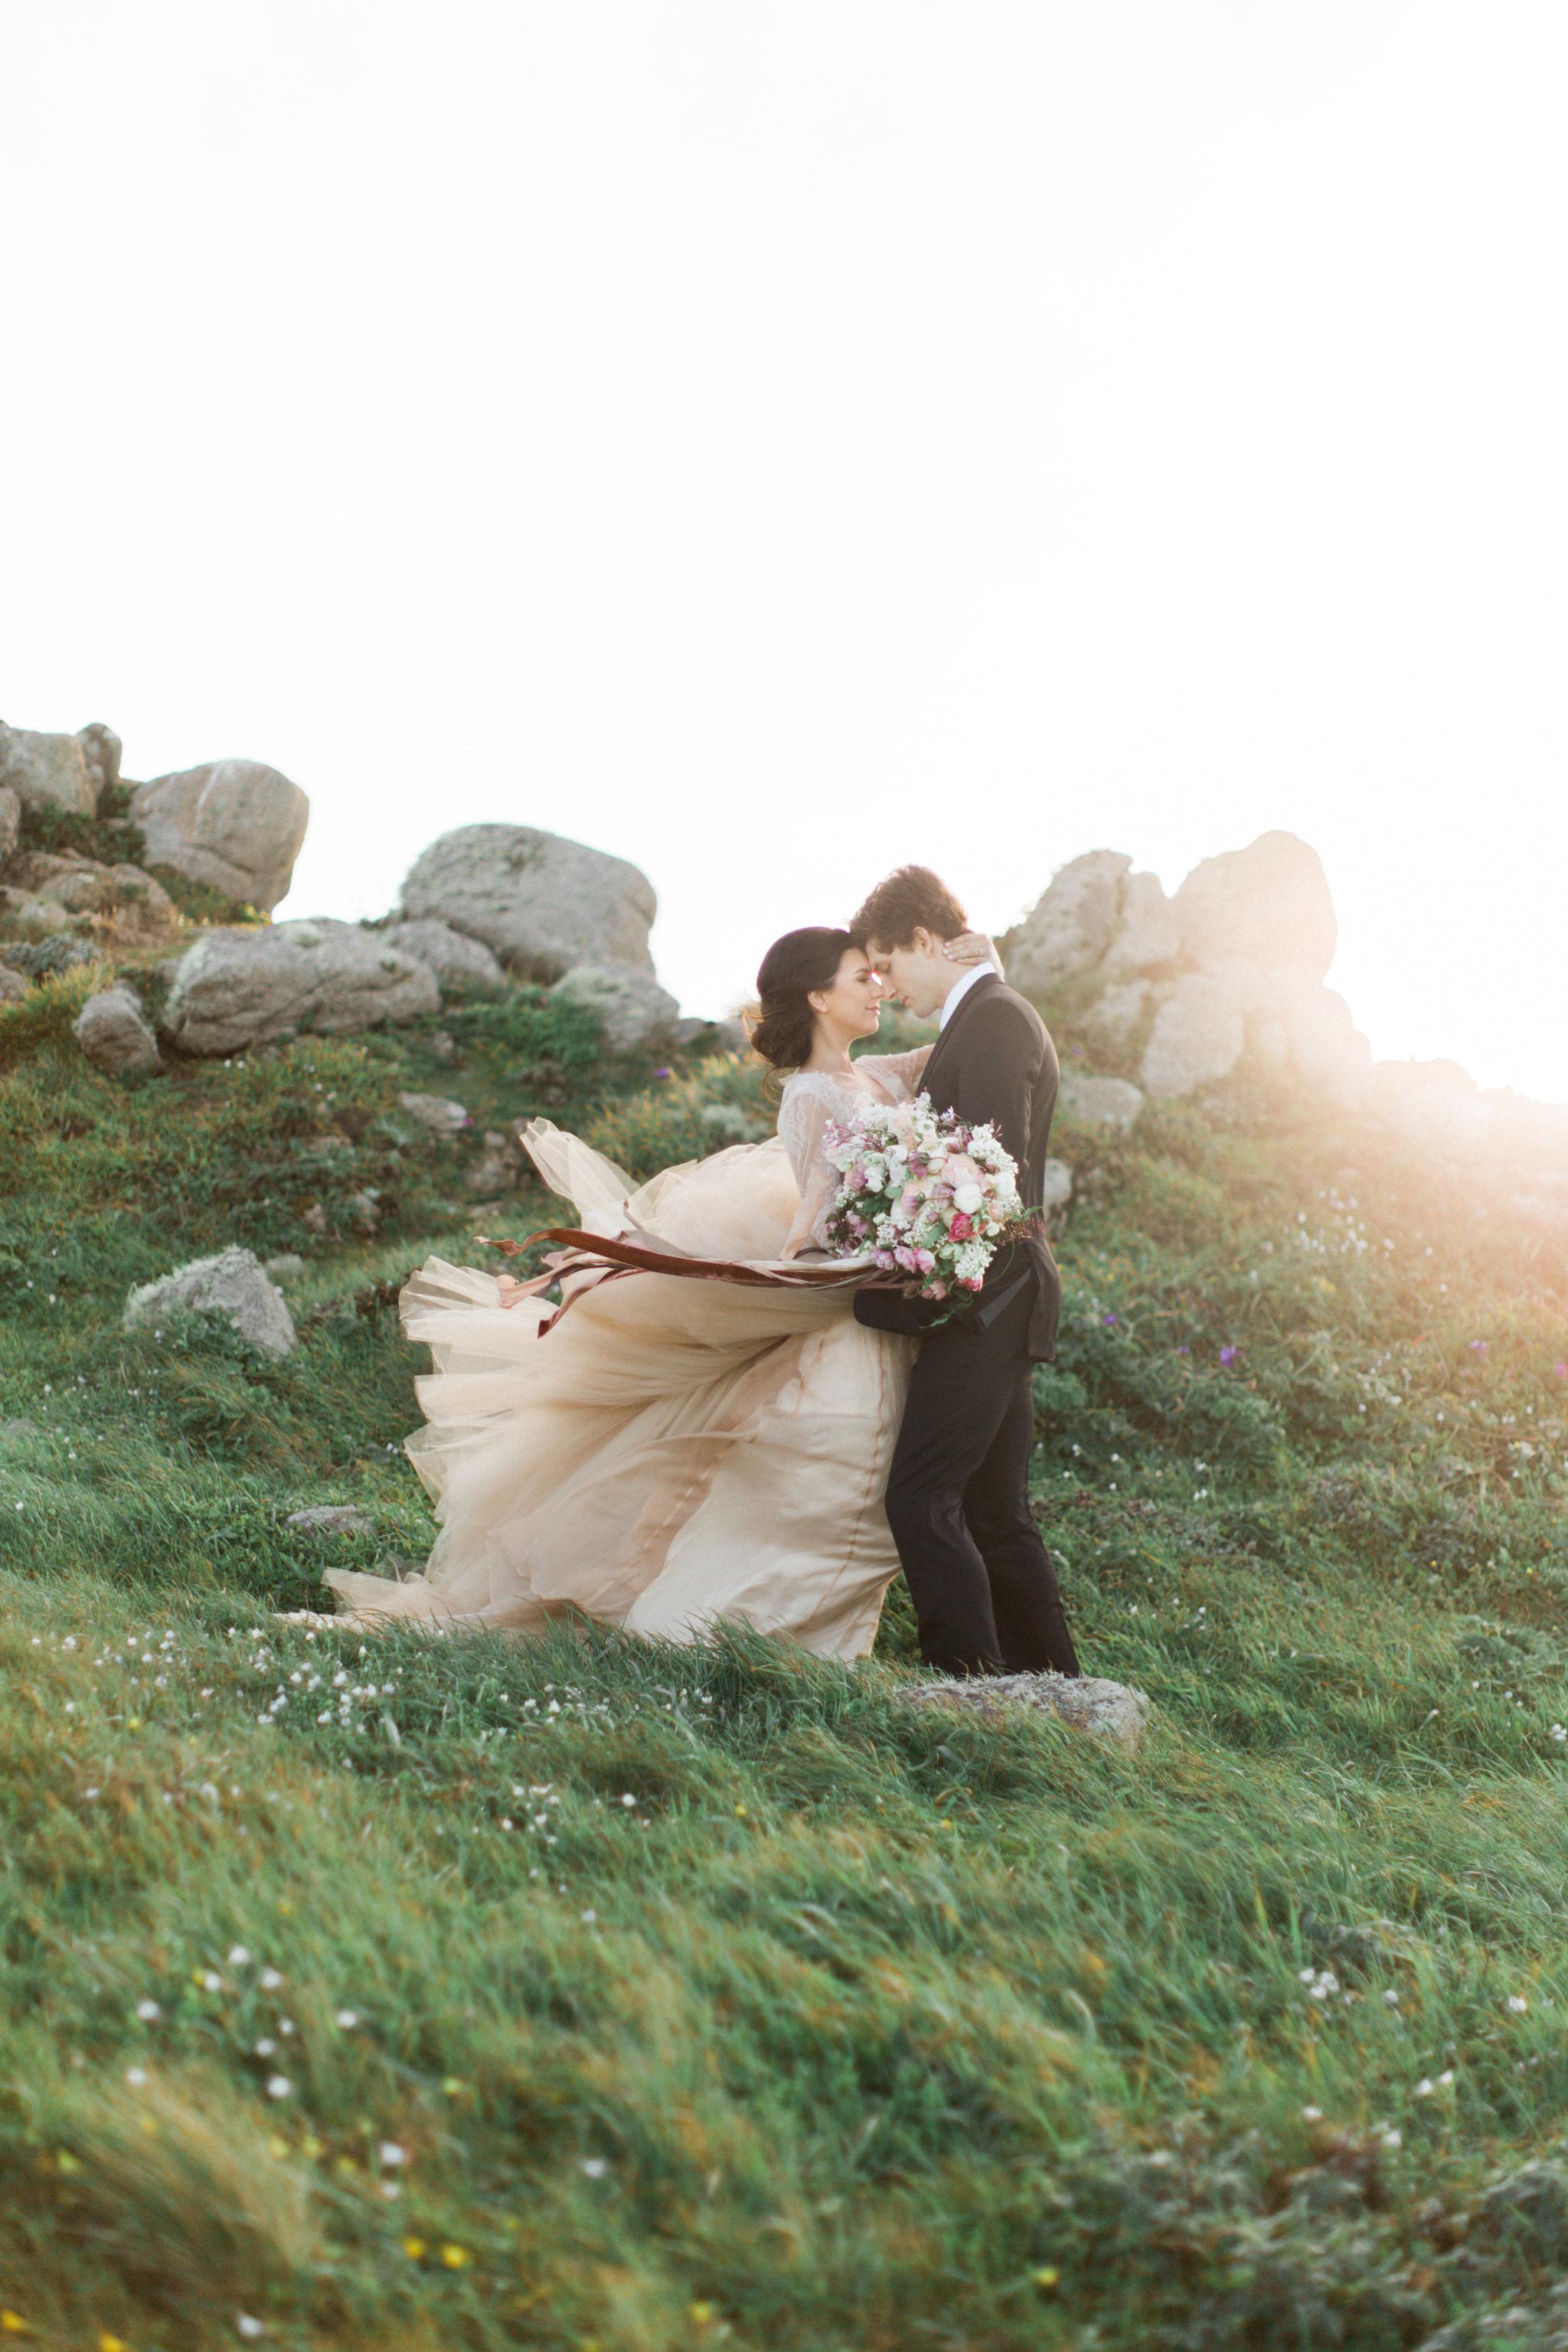 Cliffside Wedding | Tyler Rye Workshop | Point Reyes | Nicole Lapierre | Canadian Wedding Blog | Canadian Photographer | Joy Wed | Fine Art Wedding Blog | Peach Wedding Dress | Blush Wedding Bouquet